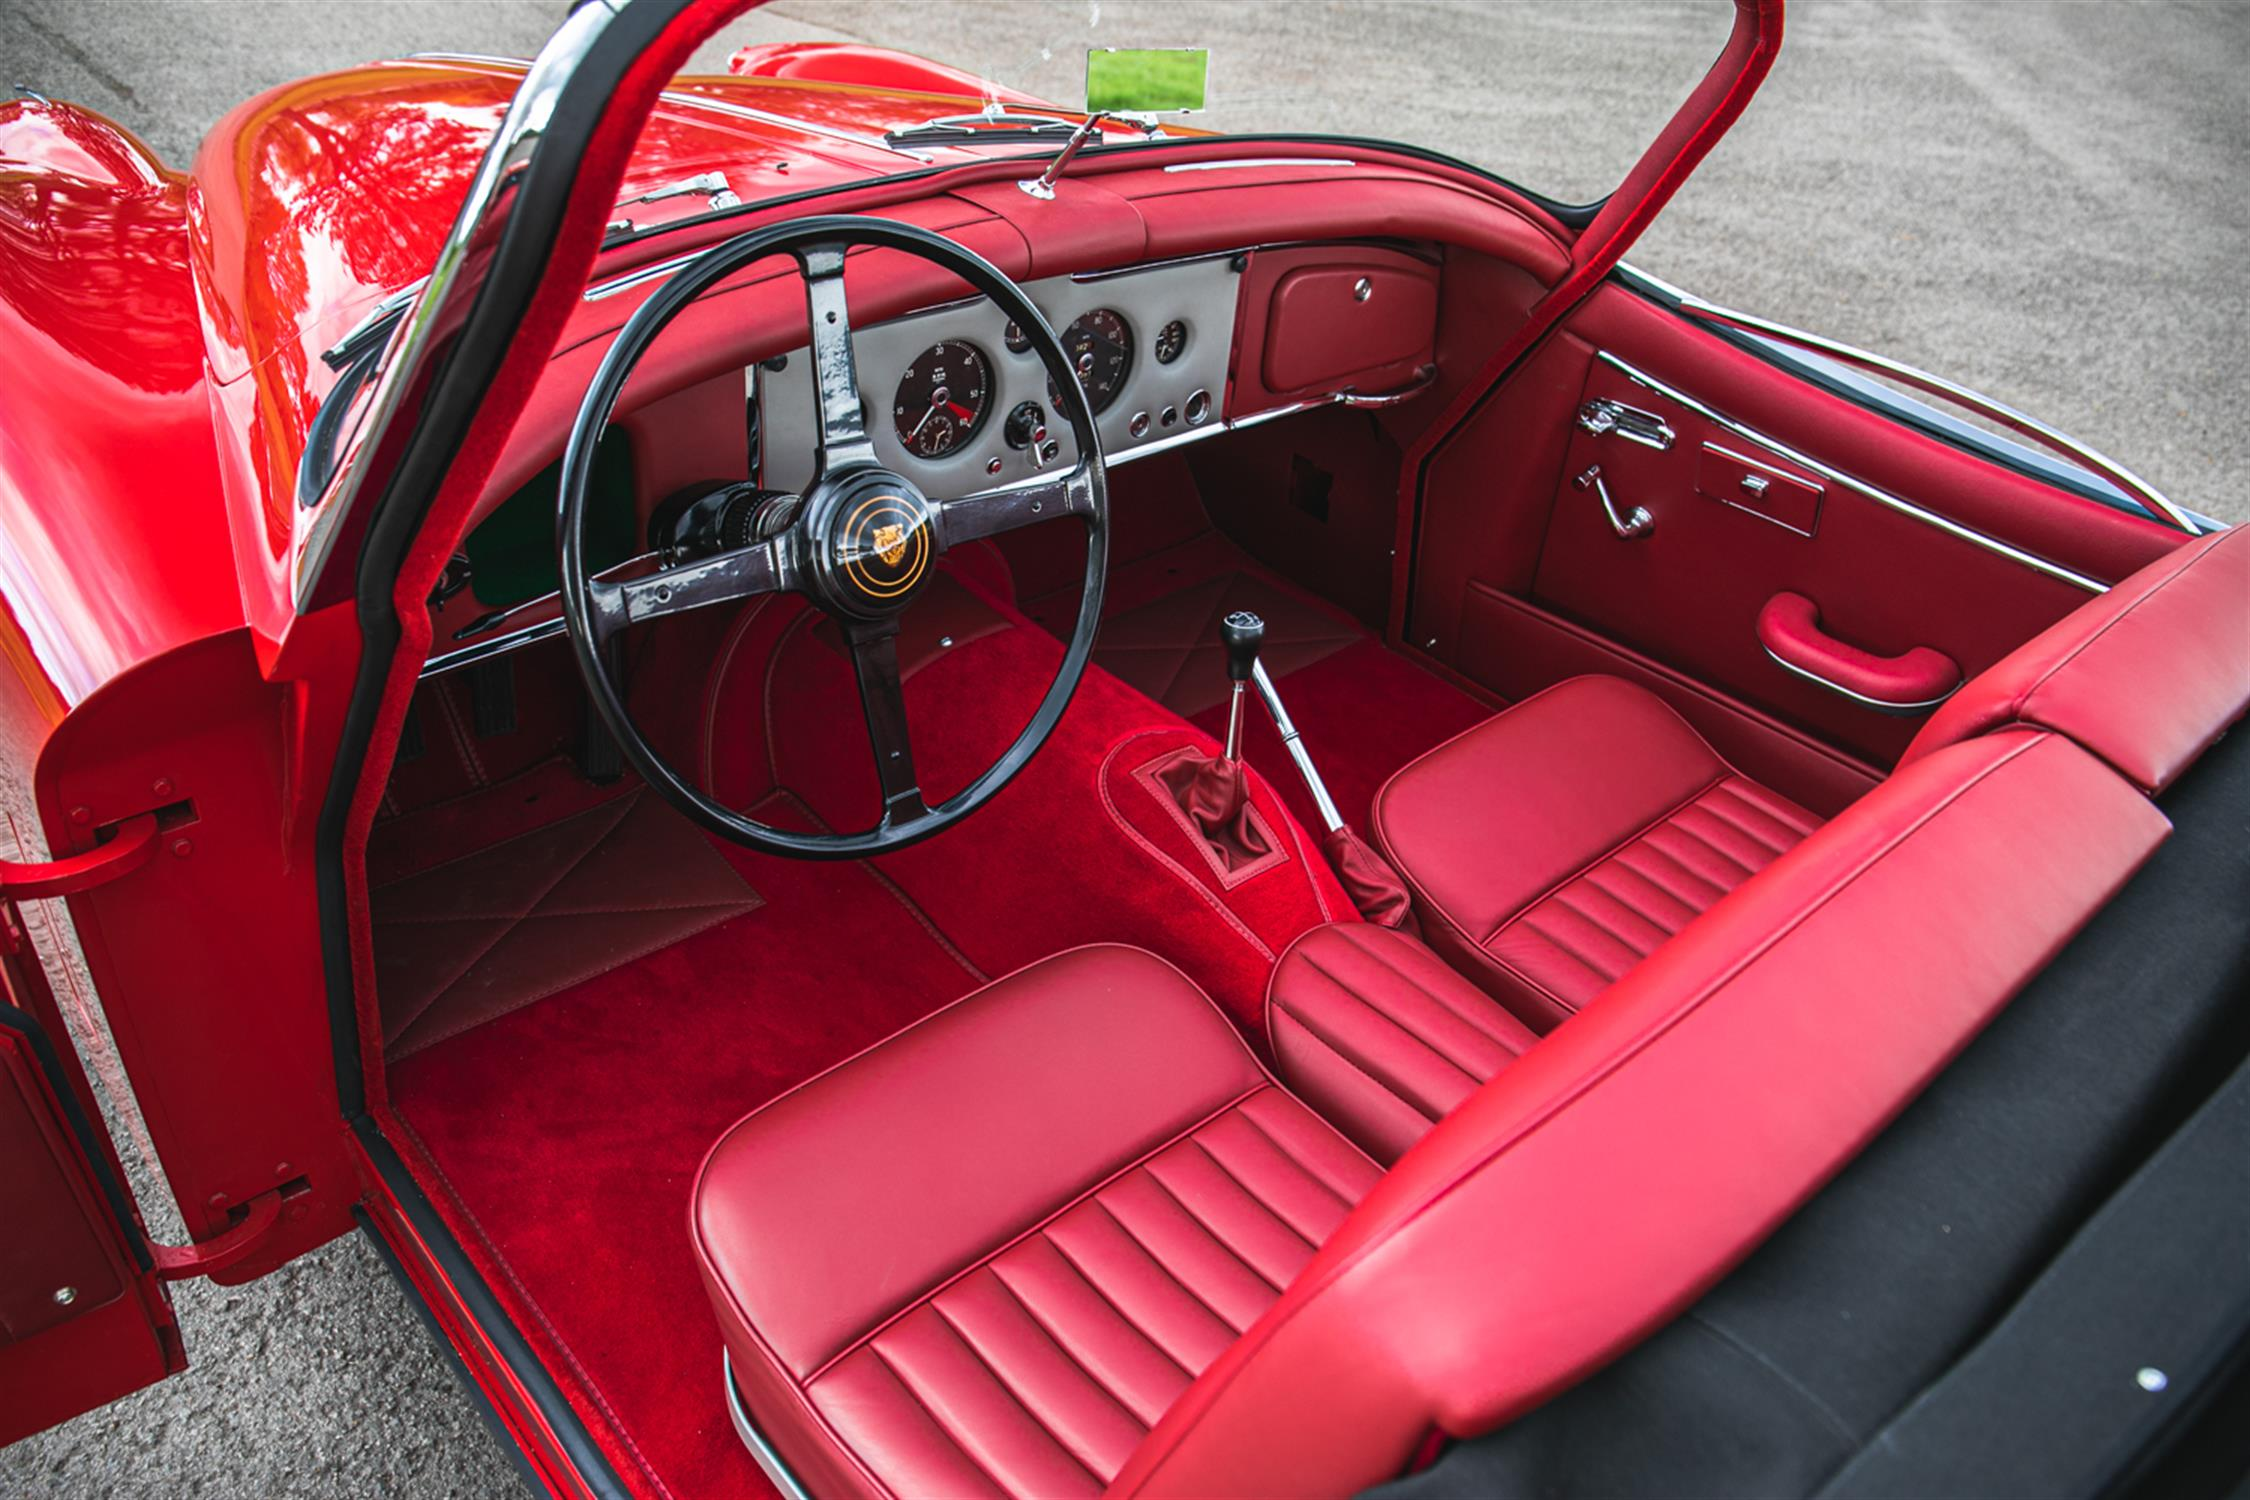 1958 Jaguar XK150 3.4-Litre 'S' Roadster (LHD) - Image 2 of 10